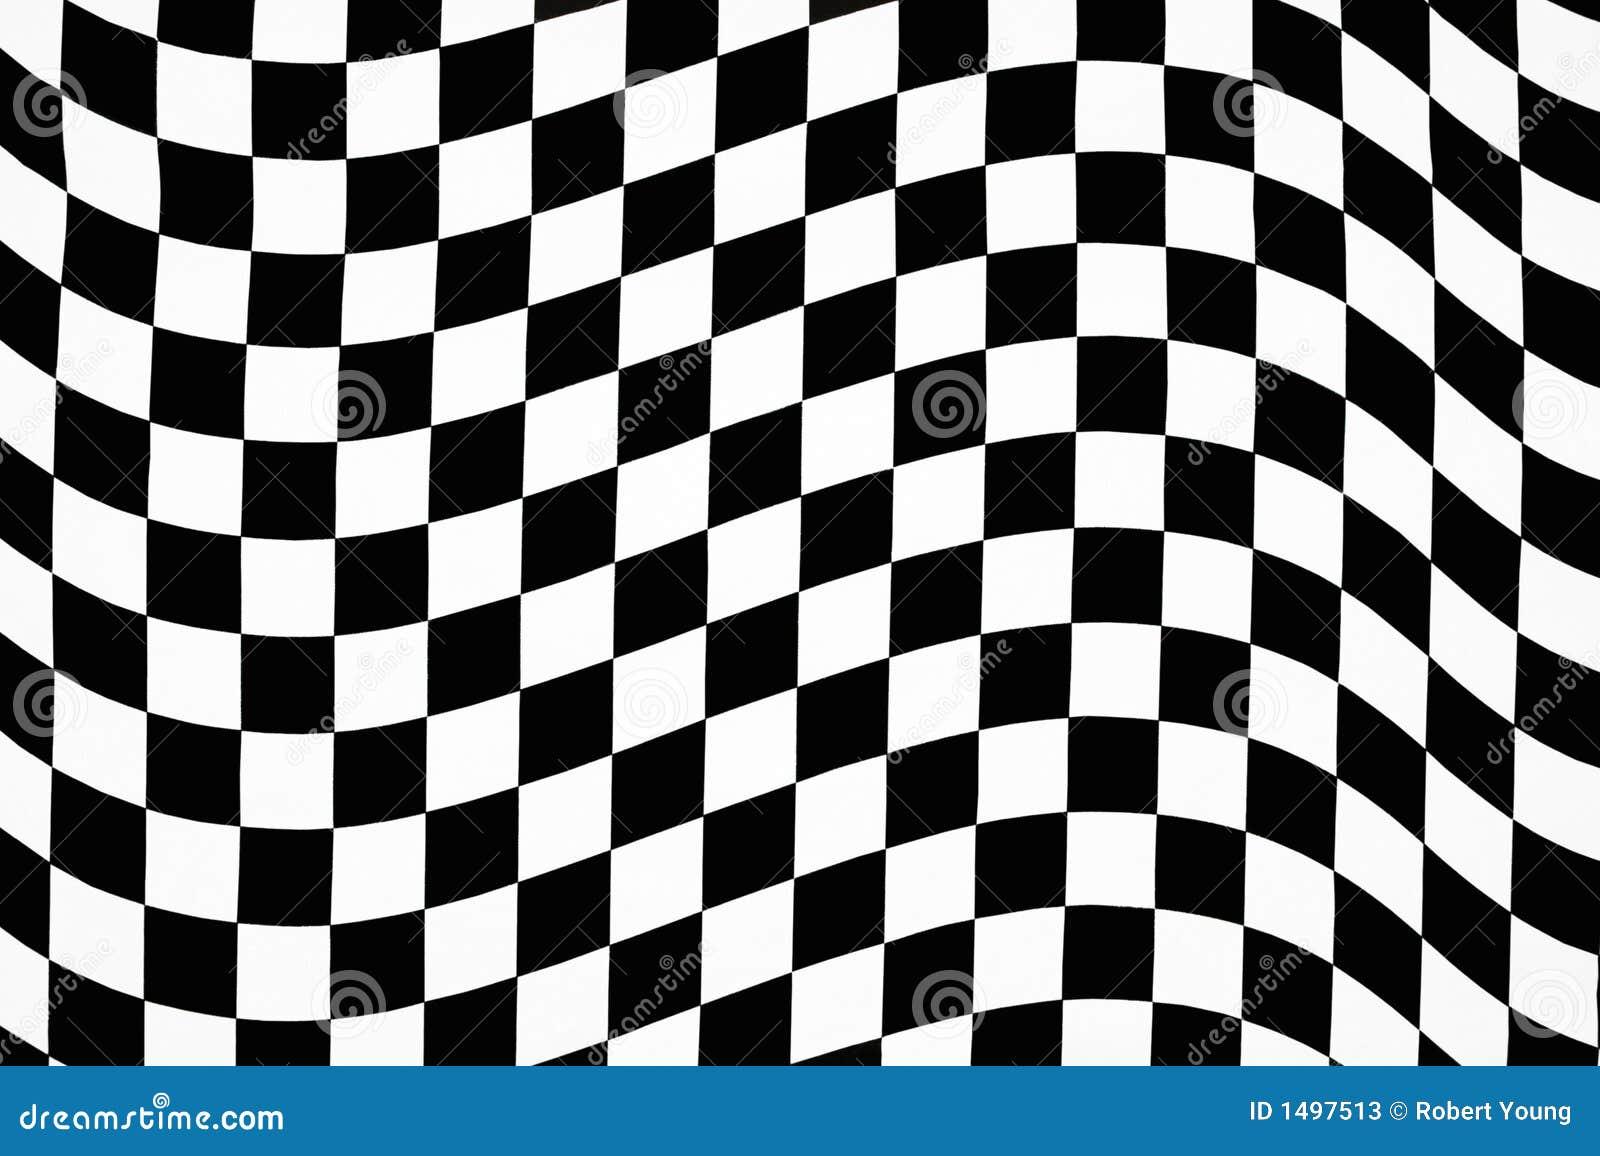 Checkered Design Wavy Checkered Pattern Stock Photos Image 1497513